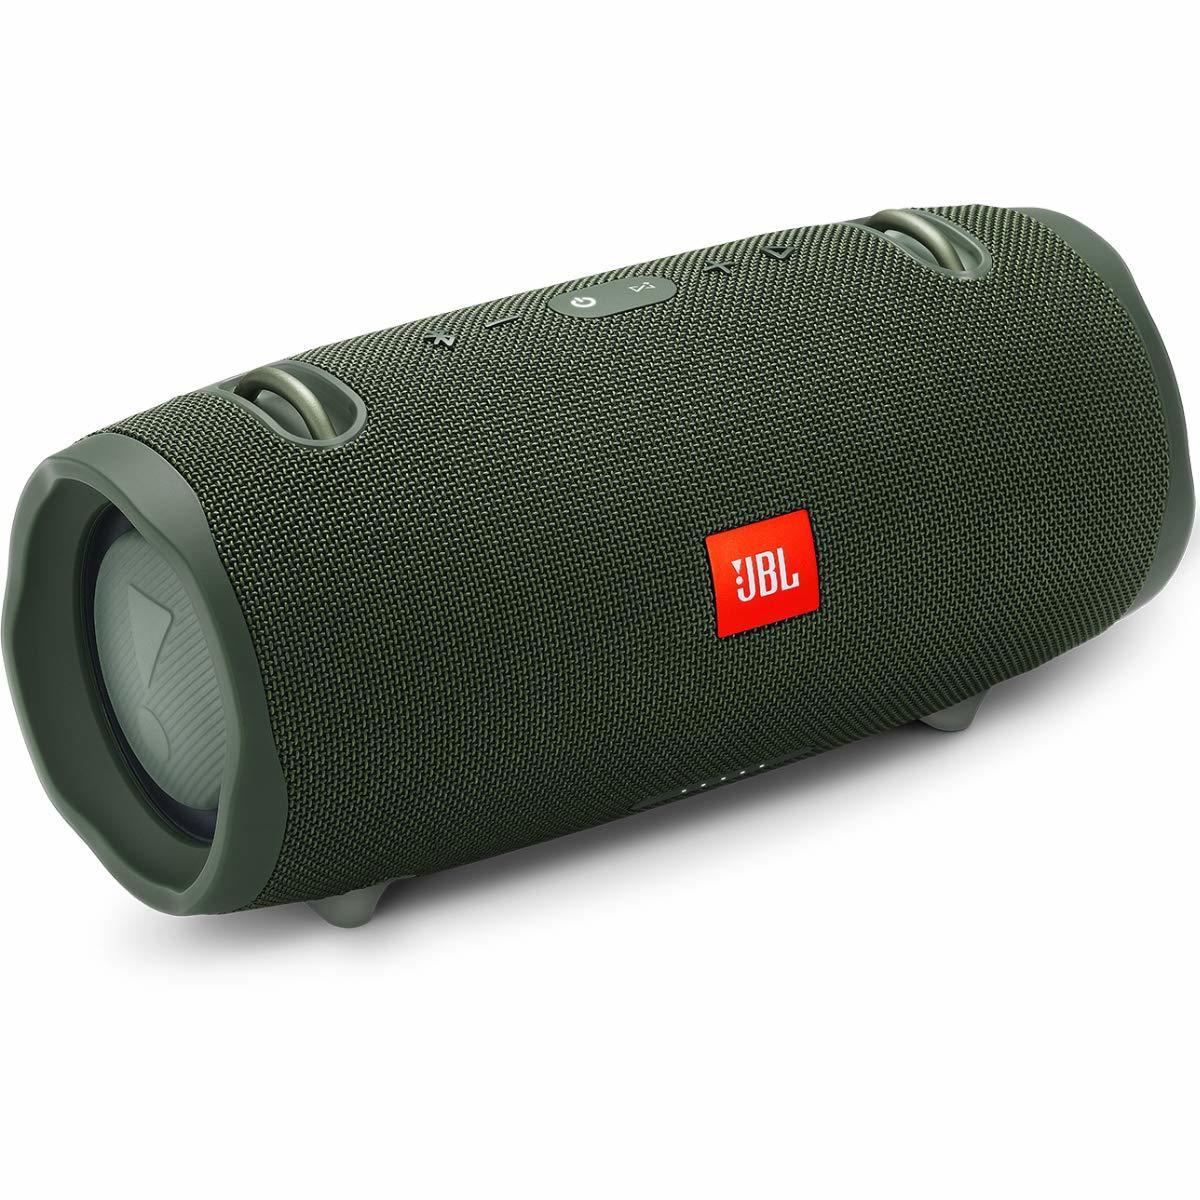 JBL Xtreme 2 Bluetooth Speaker - Green image